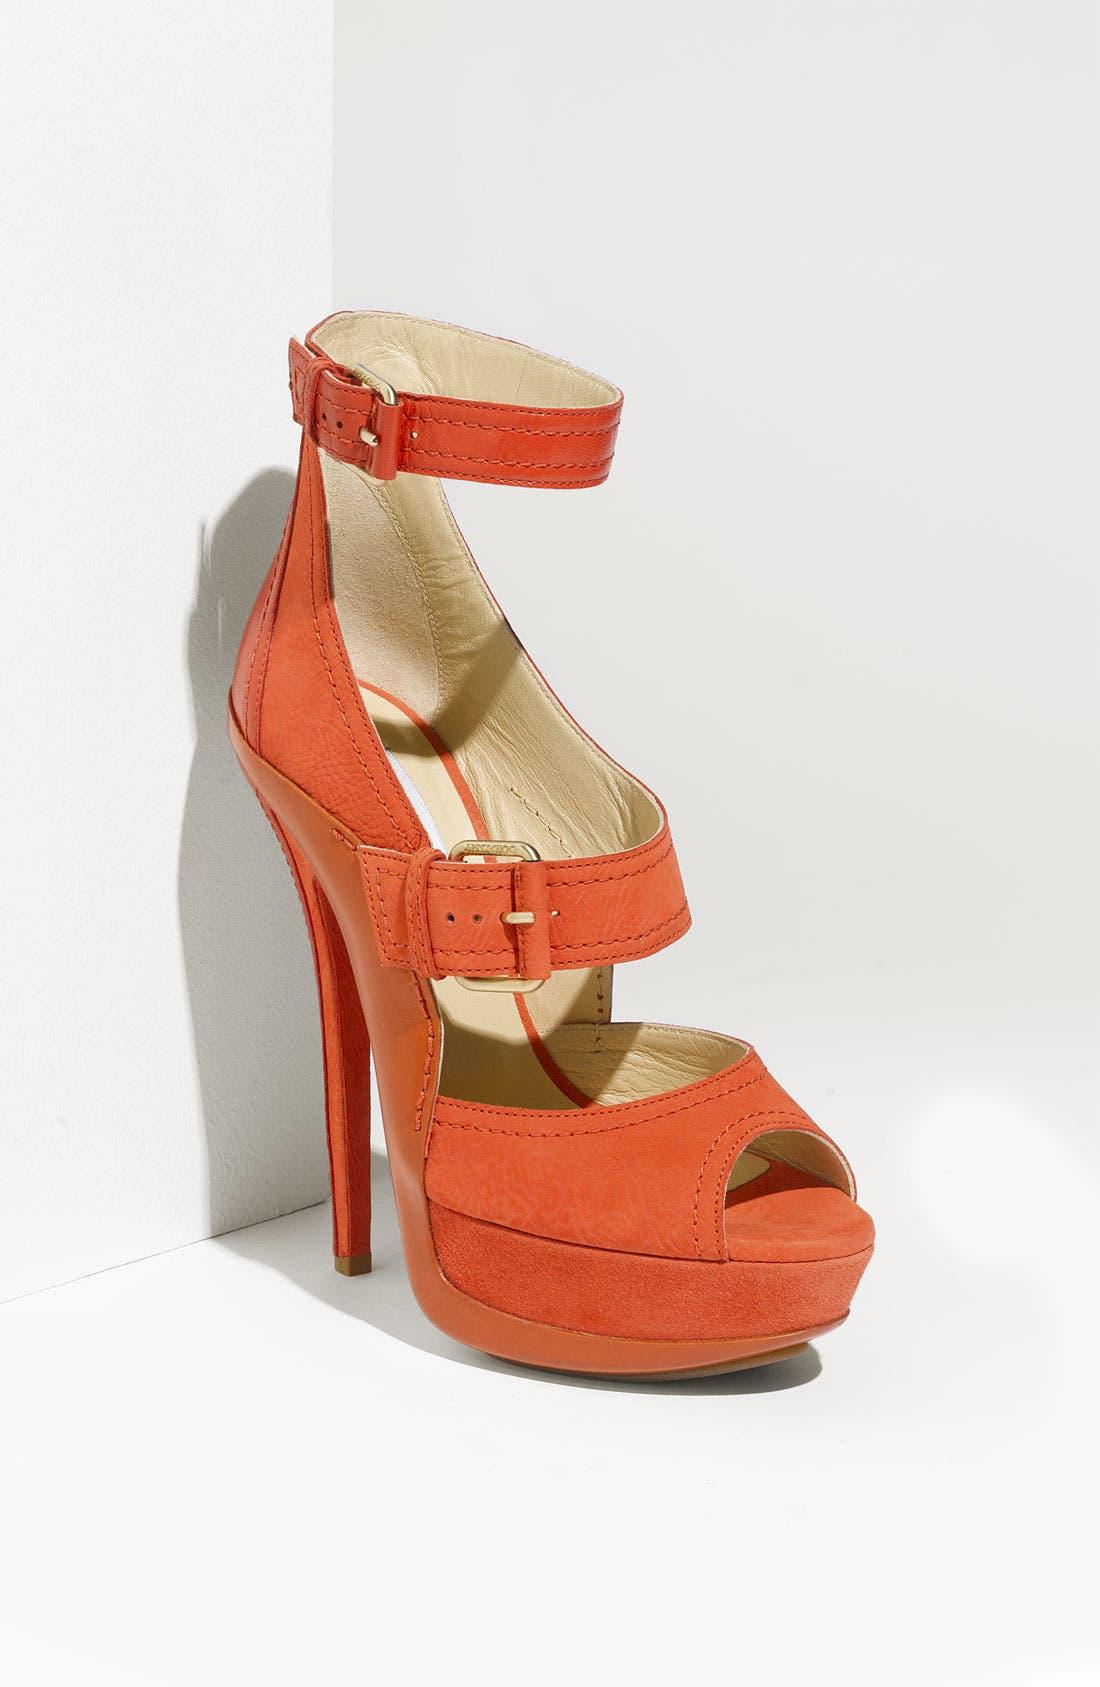 JIMMY CHOO 'Letitia' Buckle Sandal, Main, color, 950